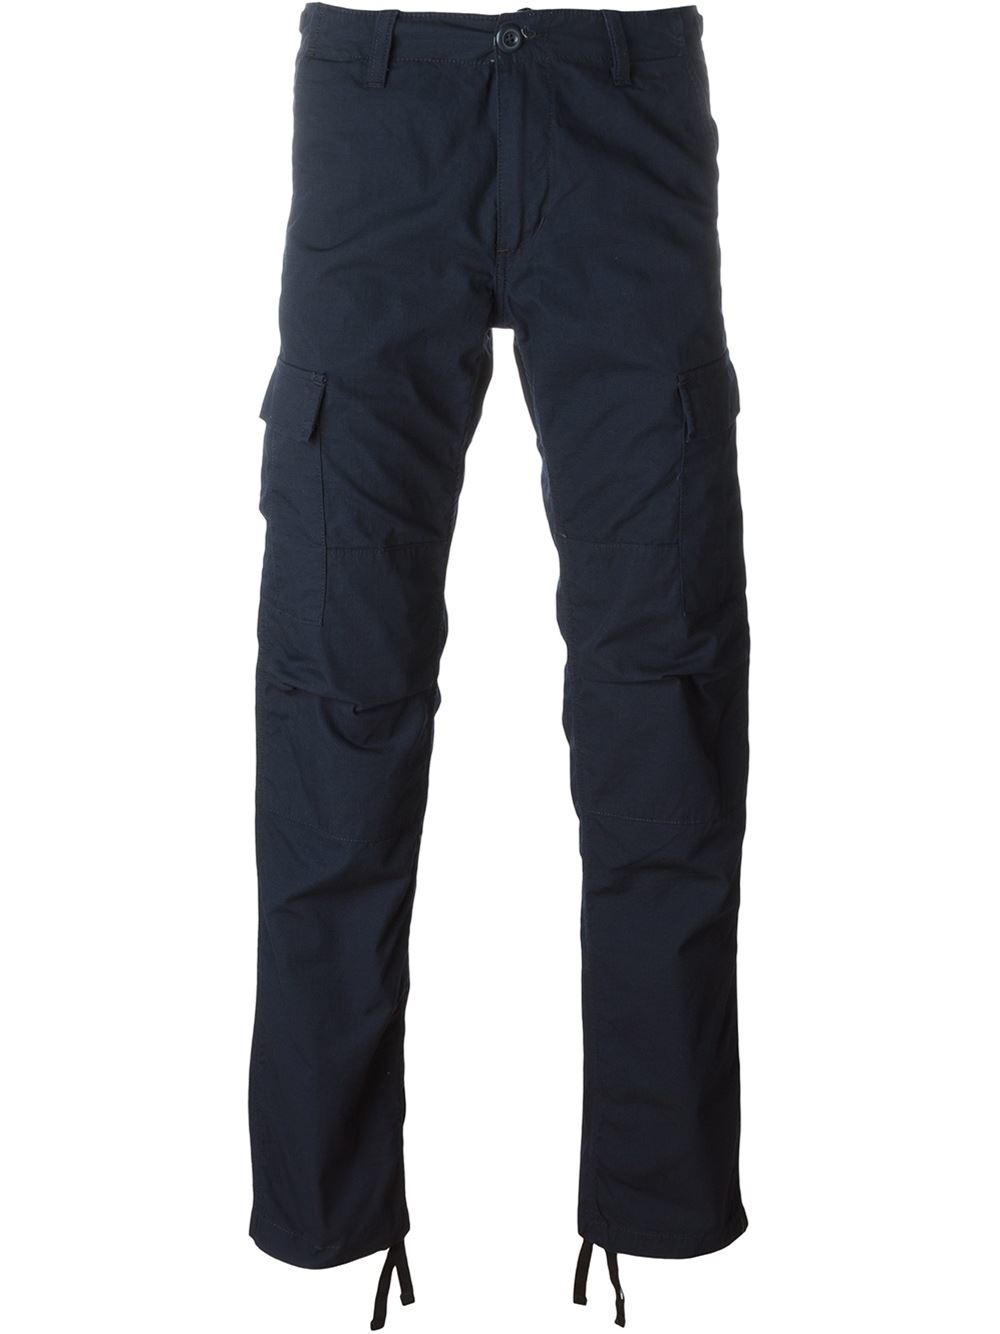 Lyst - Carhartt Cargo Slim Trousers in Blue for Men